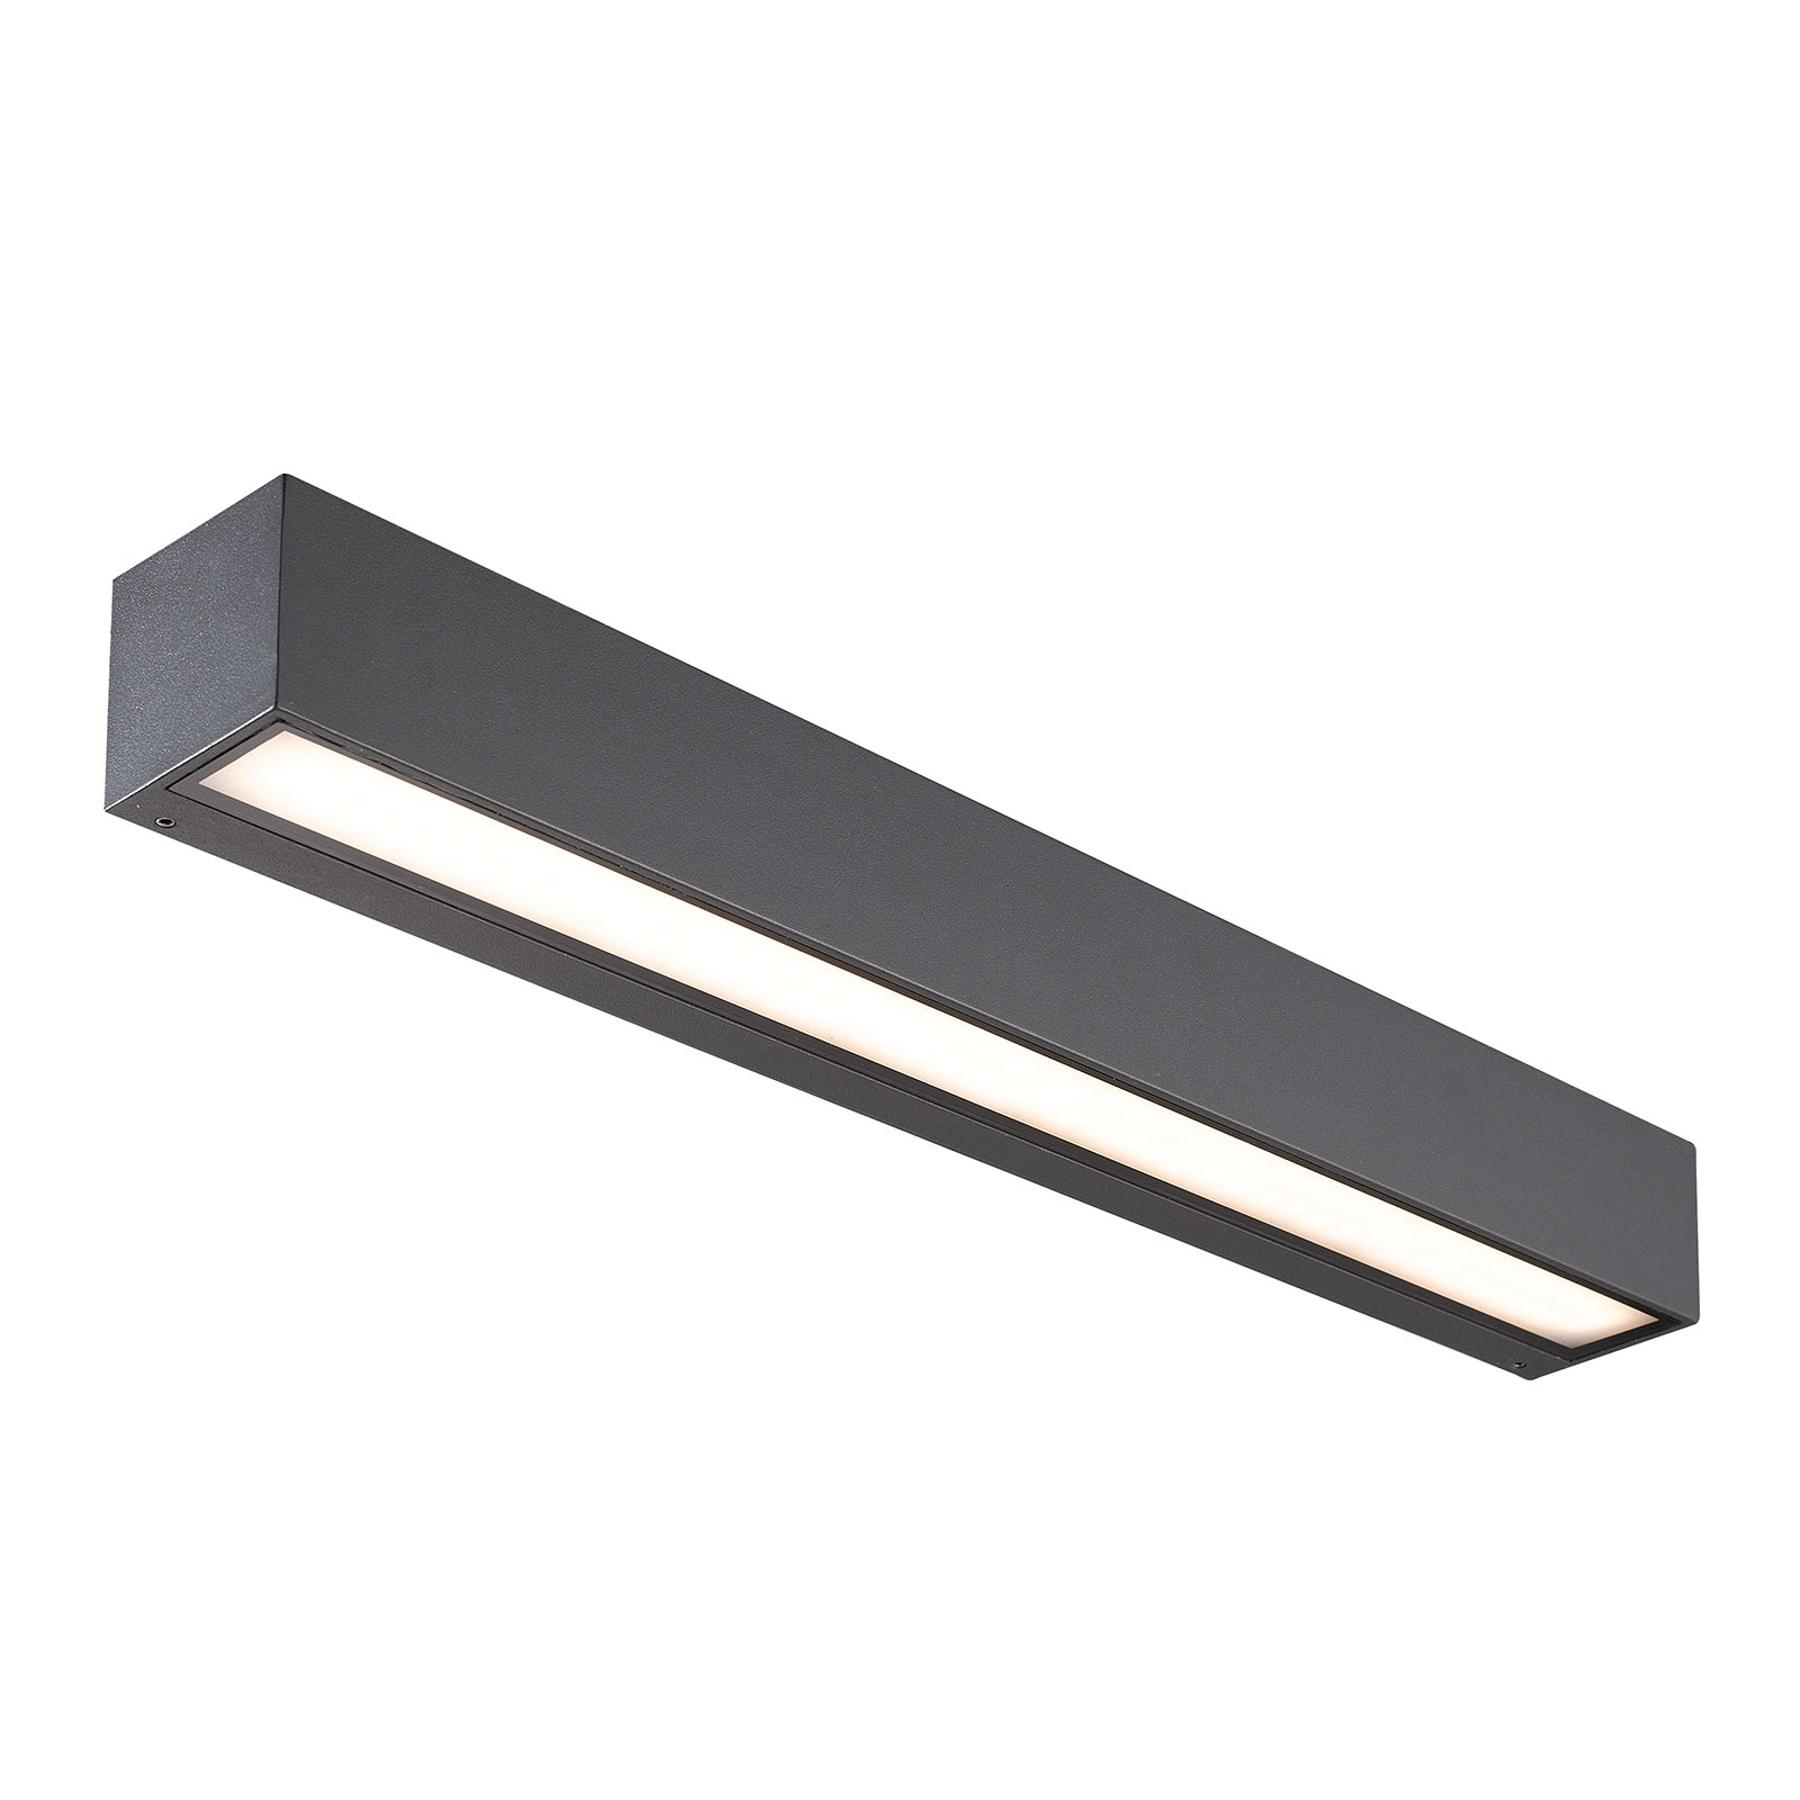 Lucande Lengo-LED-seinävalo 50cm grafiitti 1 lamp.